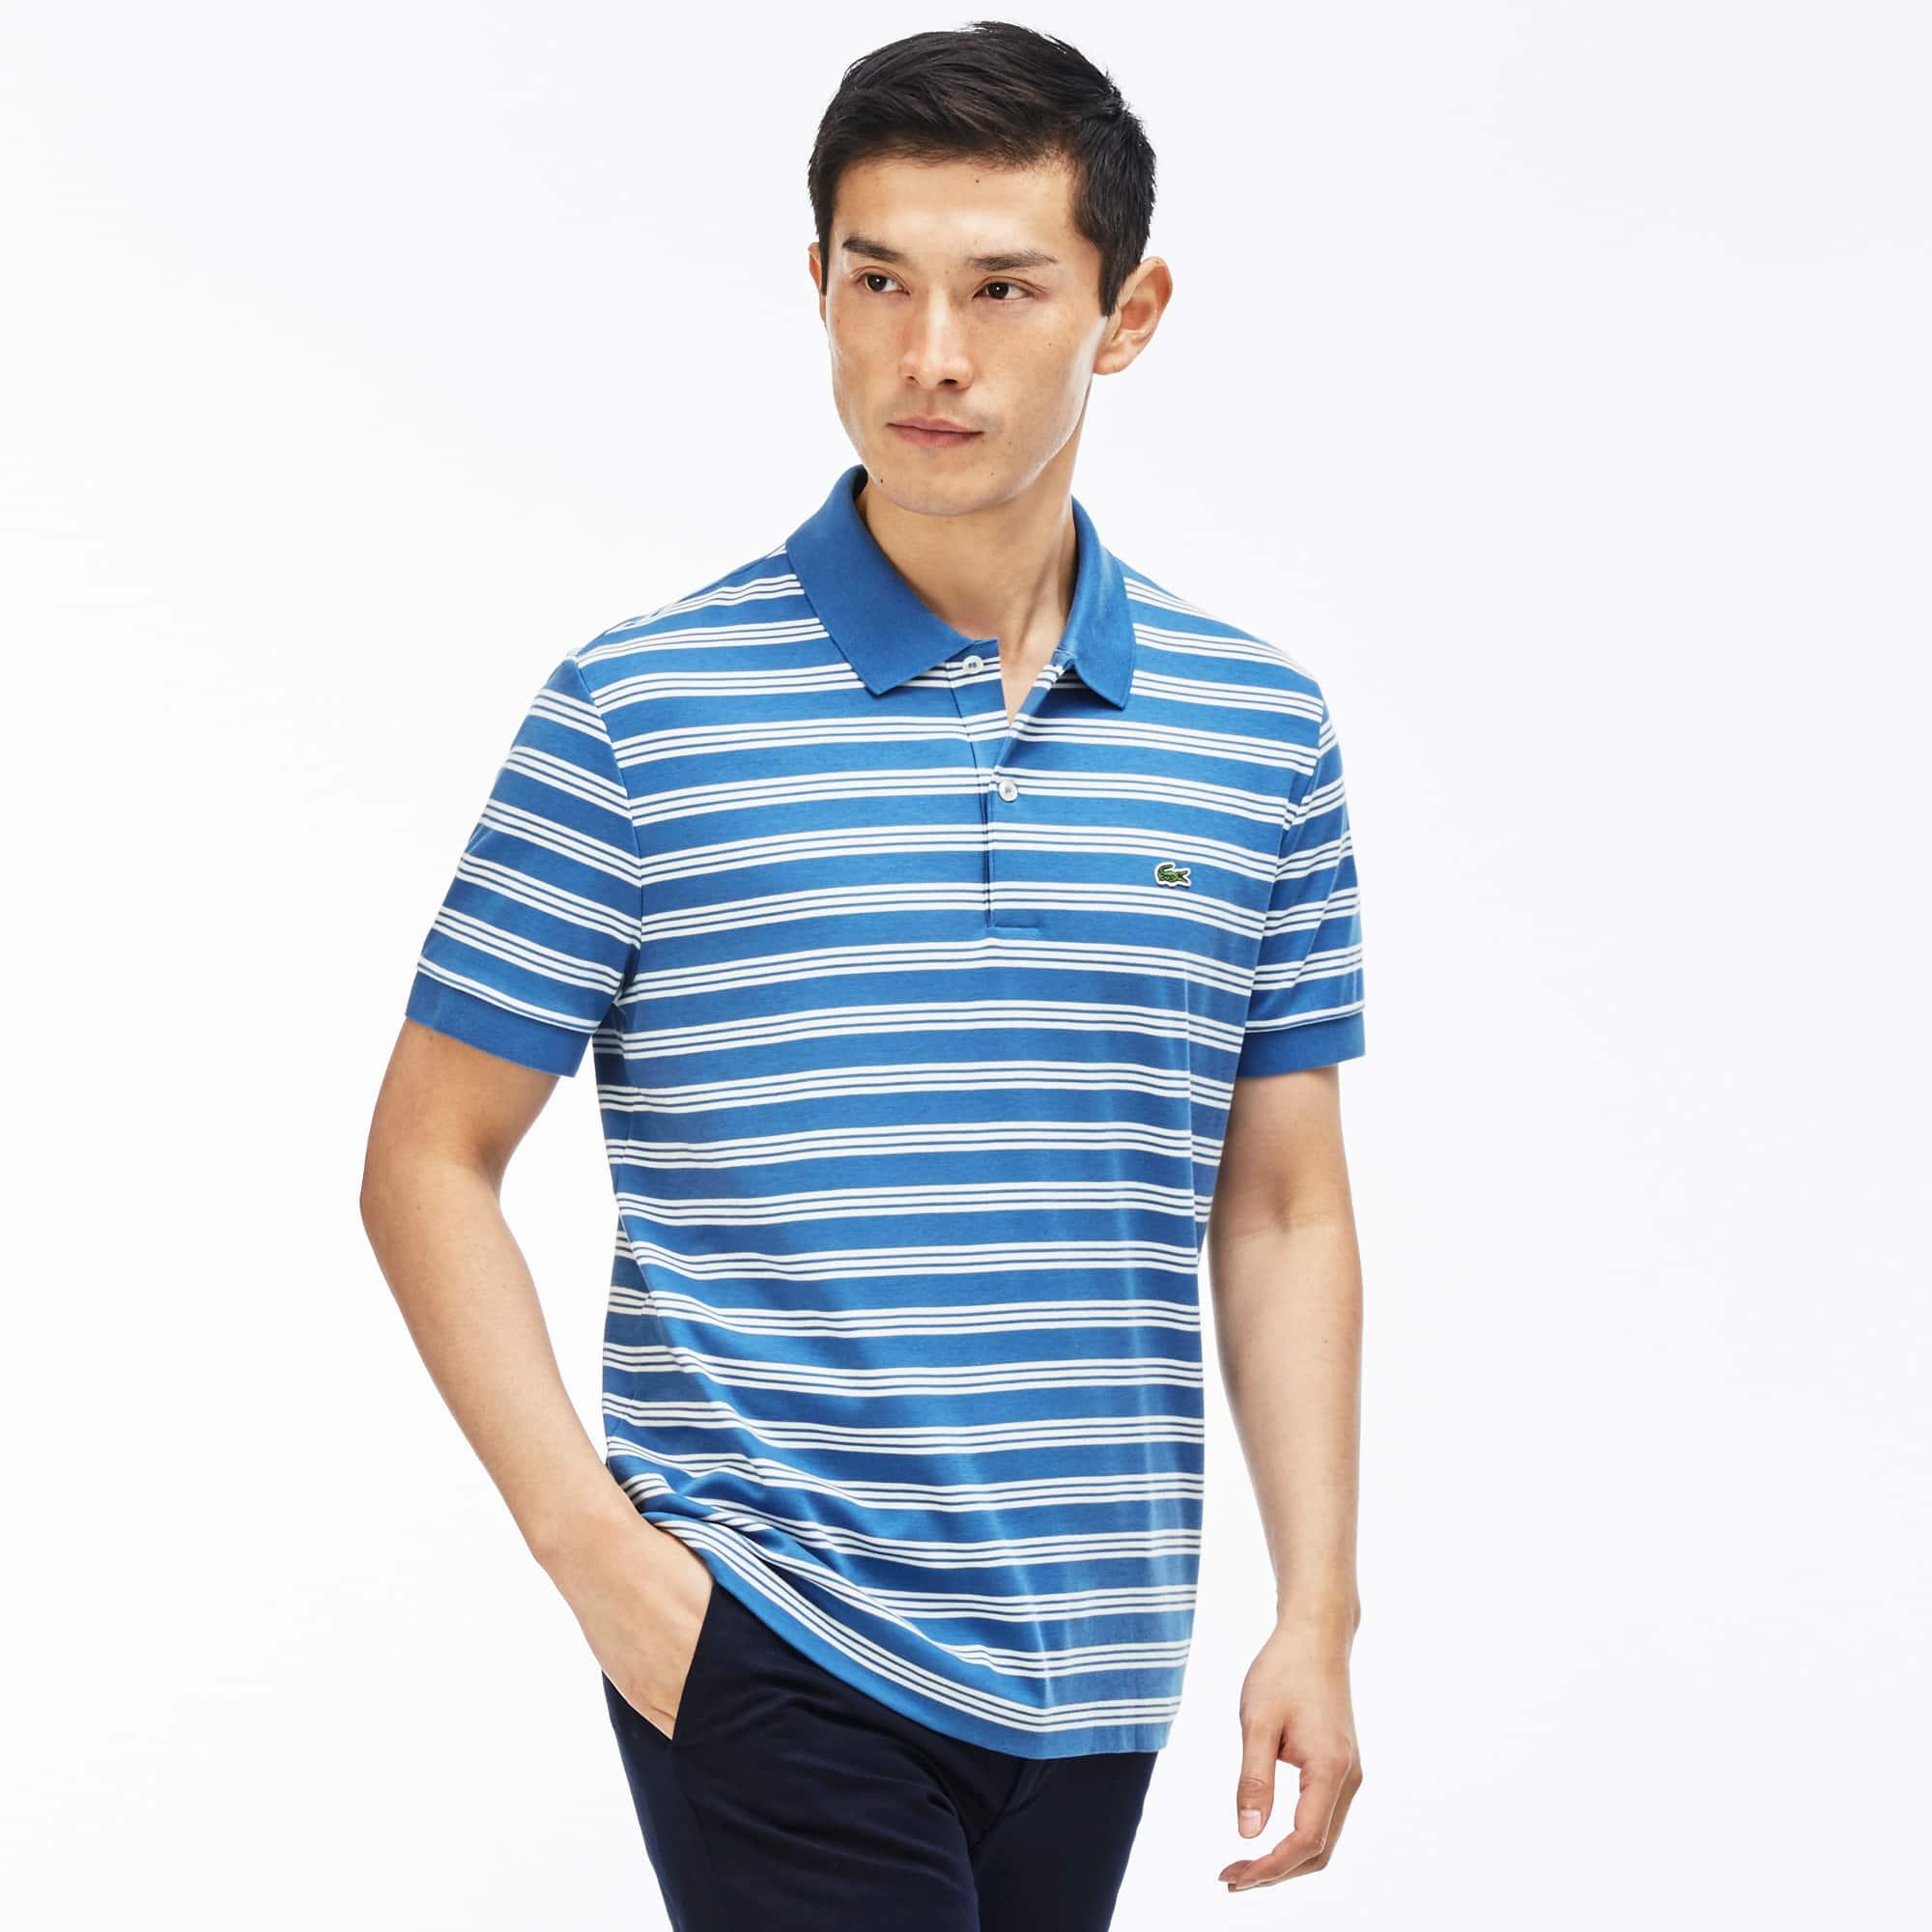 Men's Interlock Stripe Jersey Polo Shirt